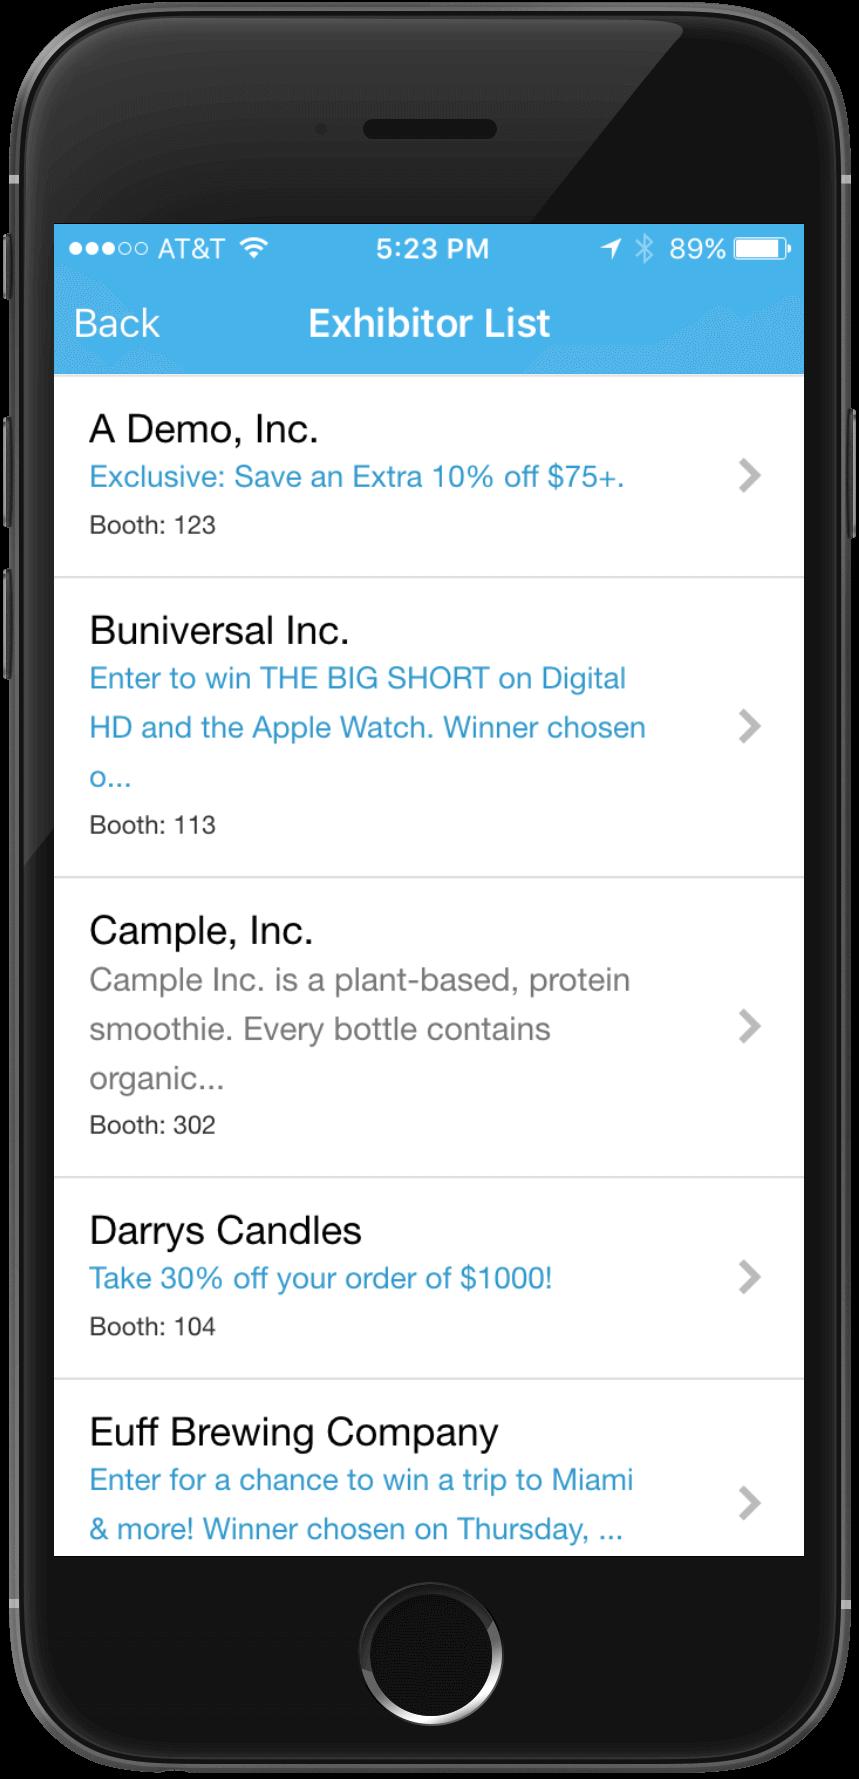 exhibitorlist-screen (2)